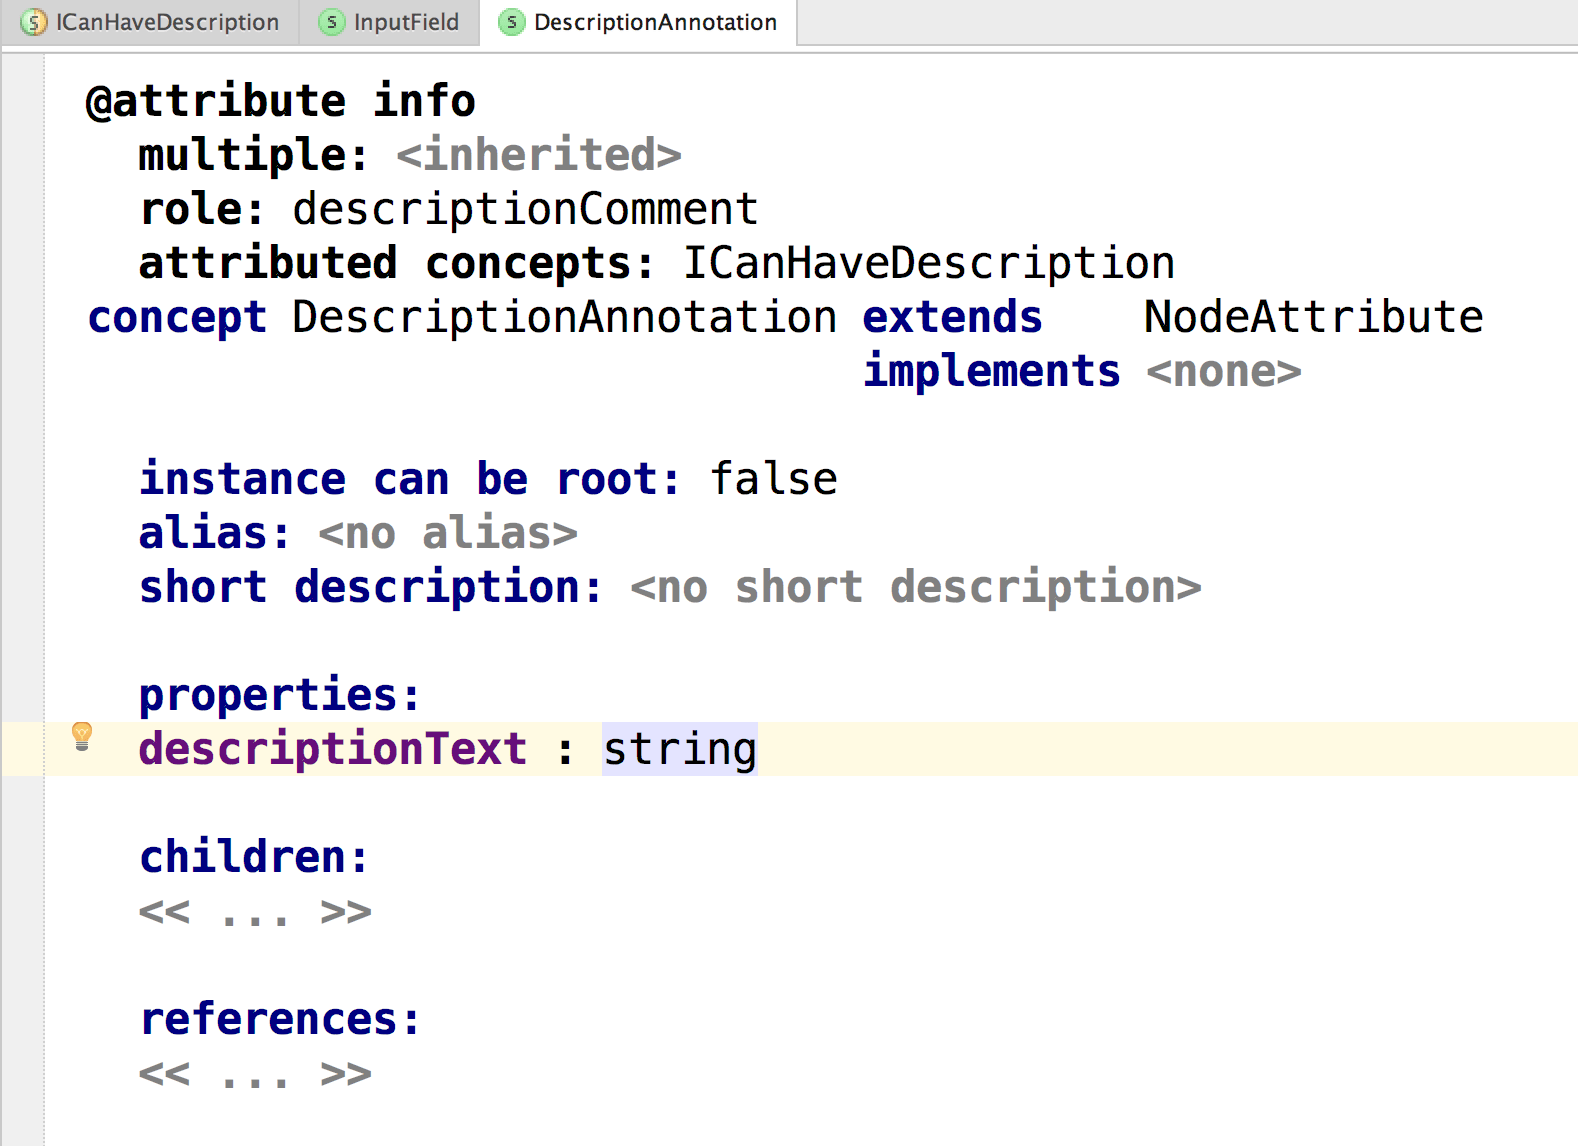 Adding the description text